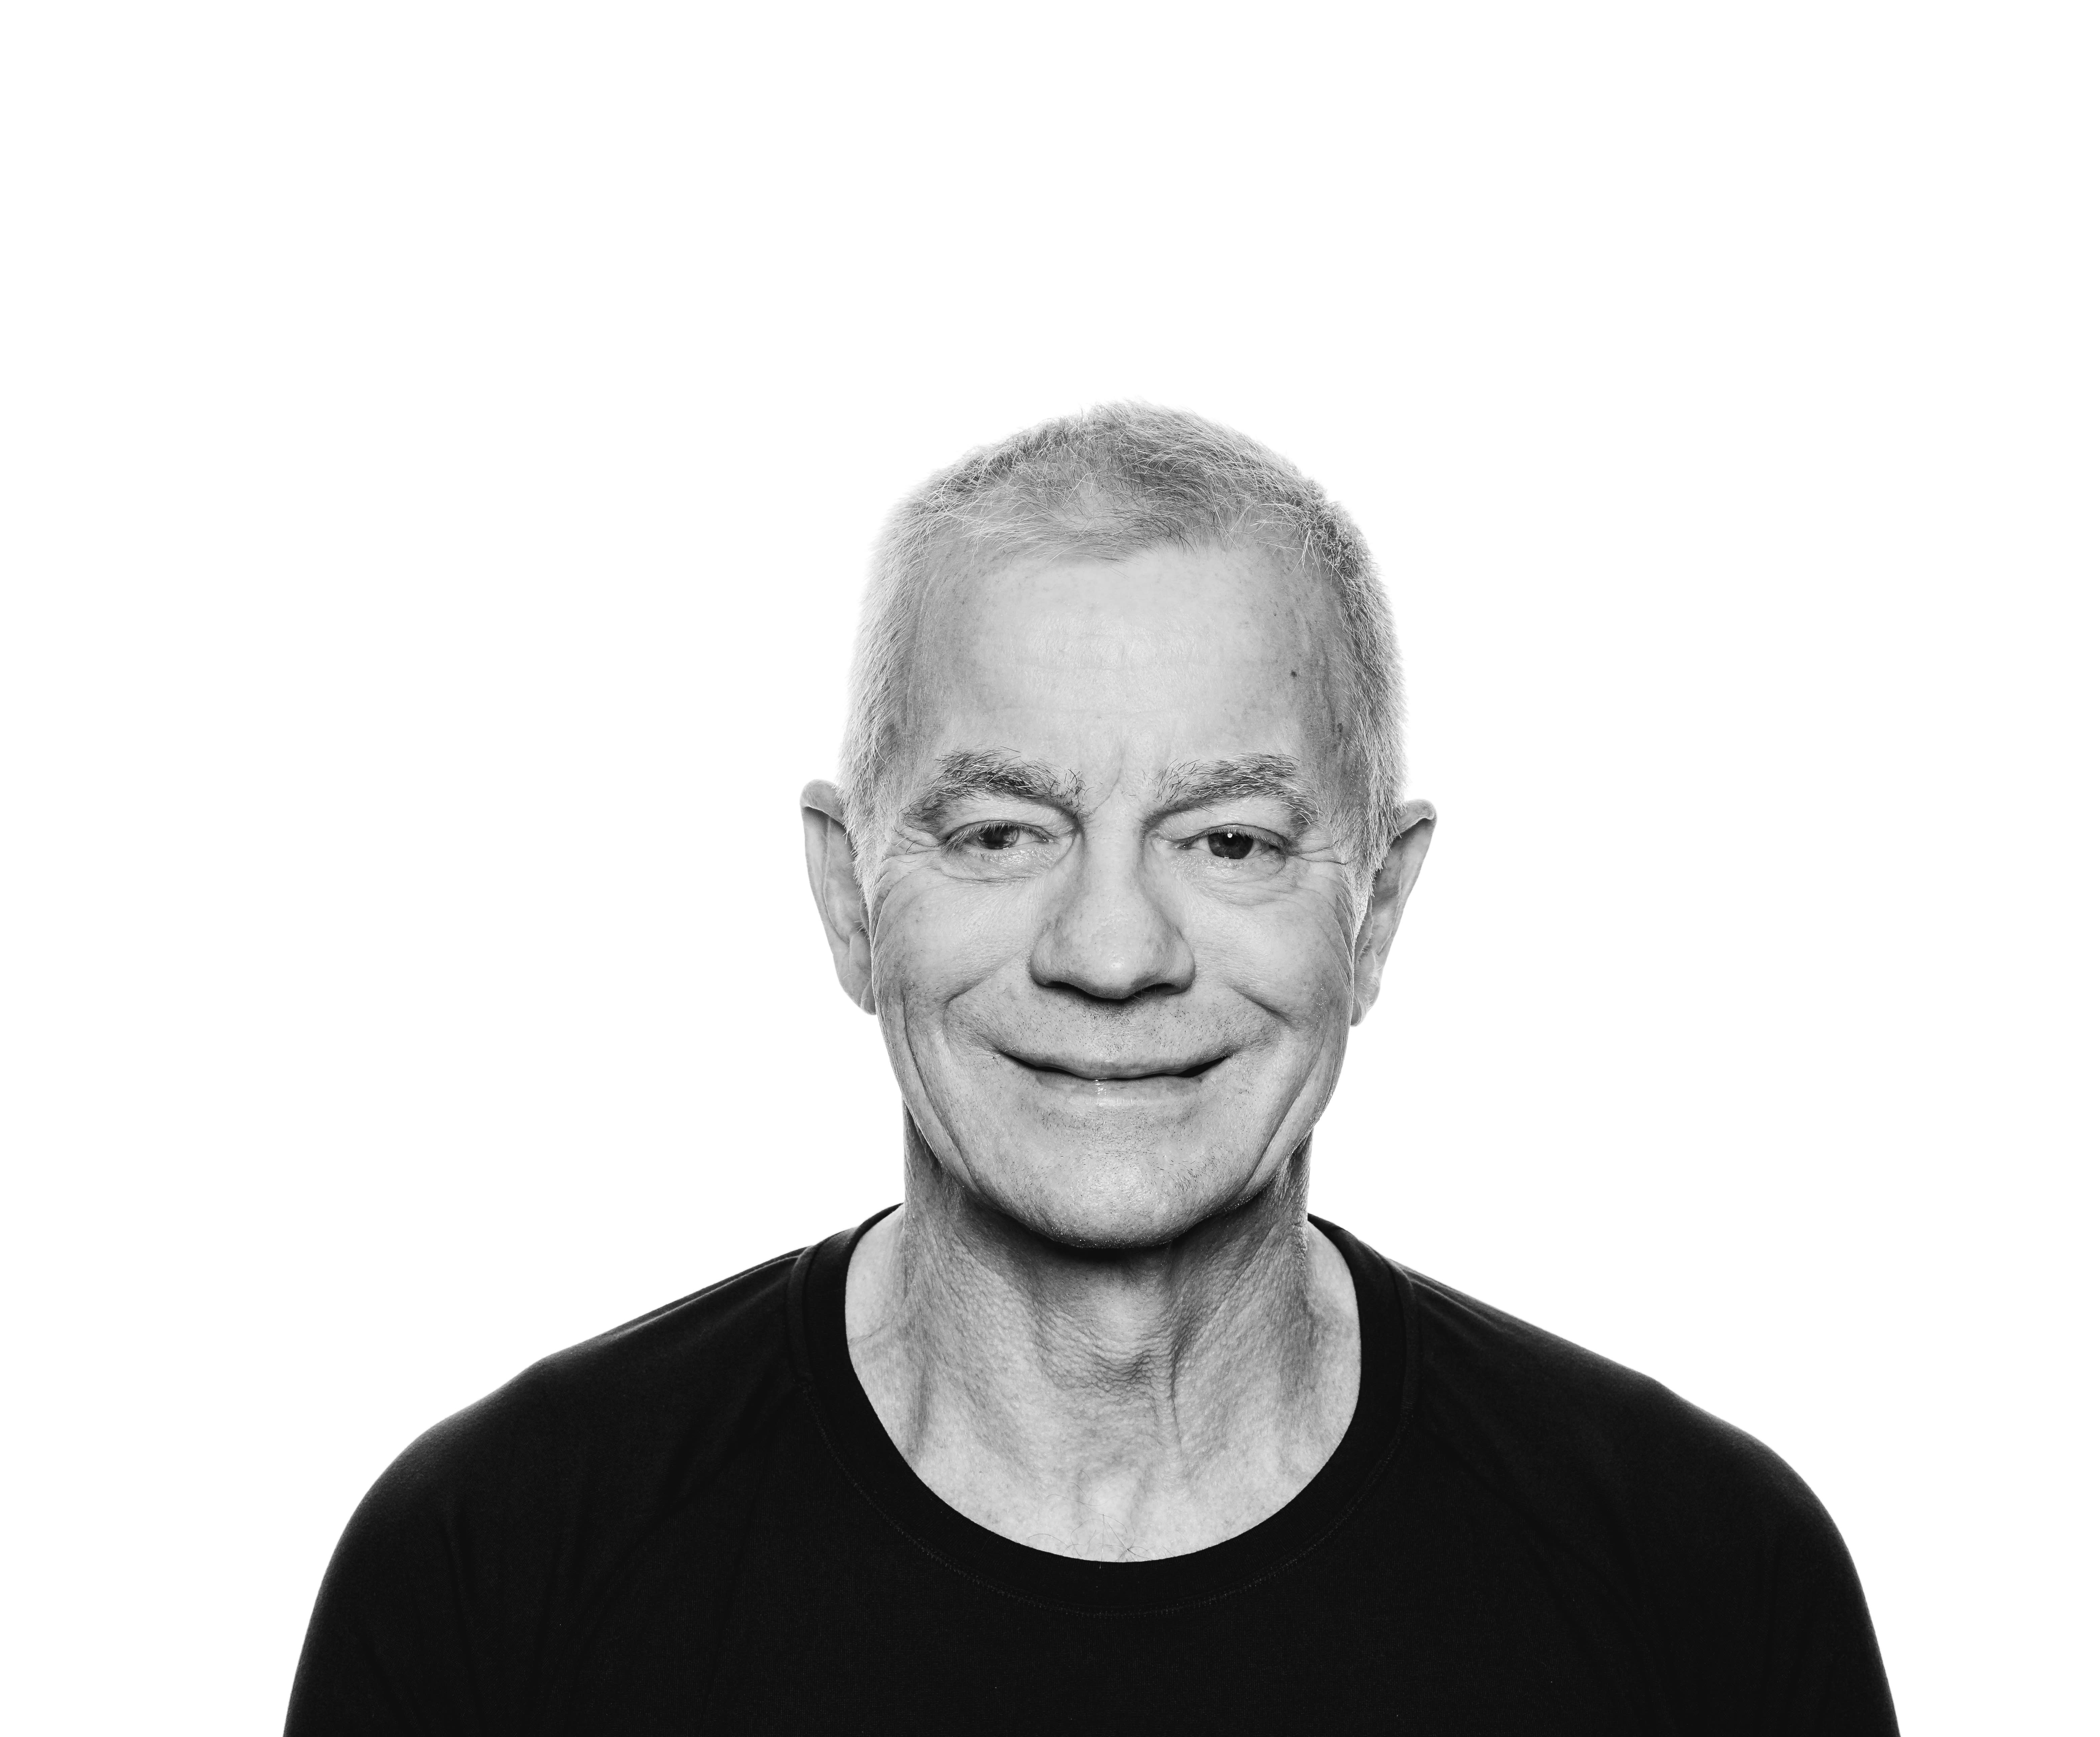 Tom Carlo Jensen